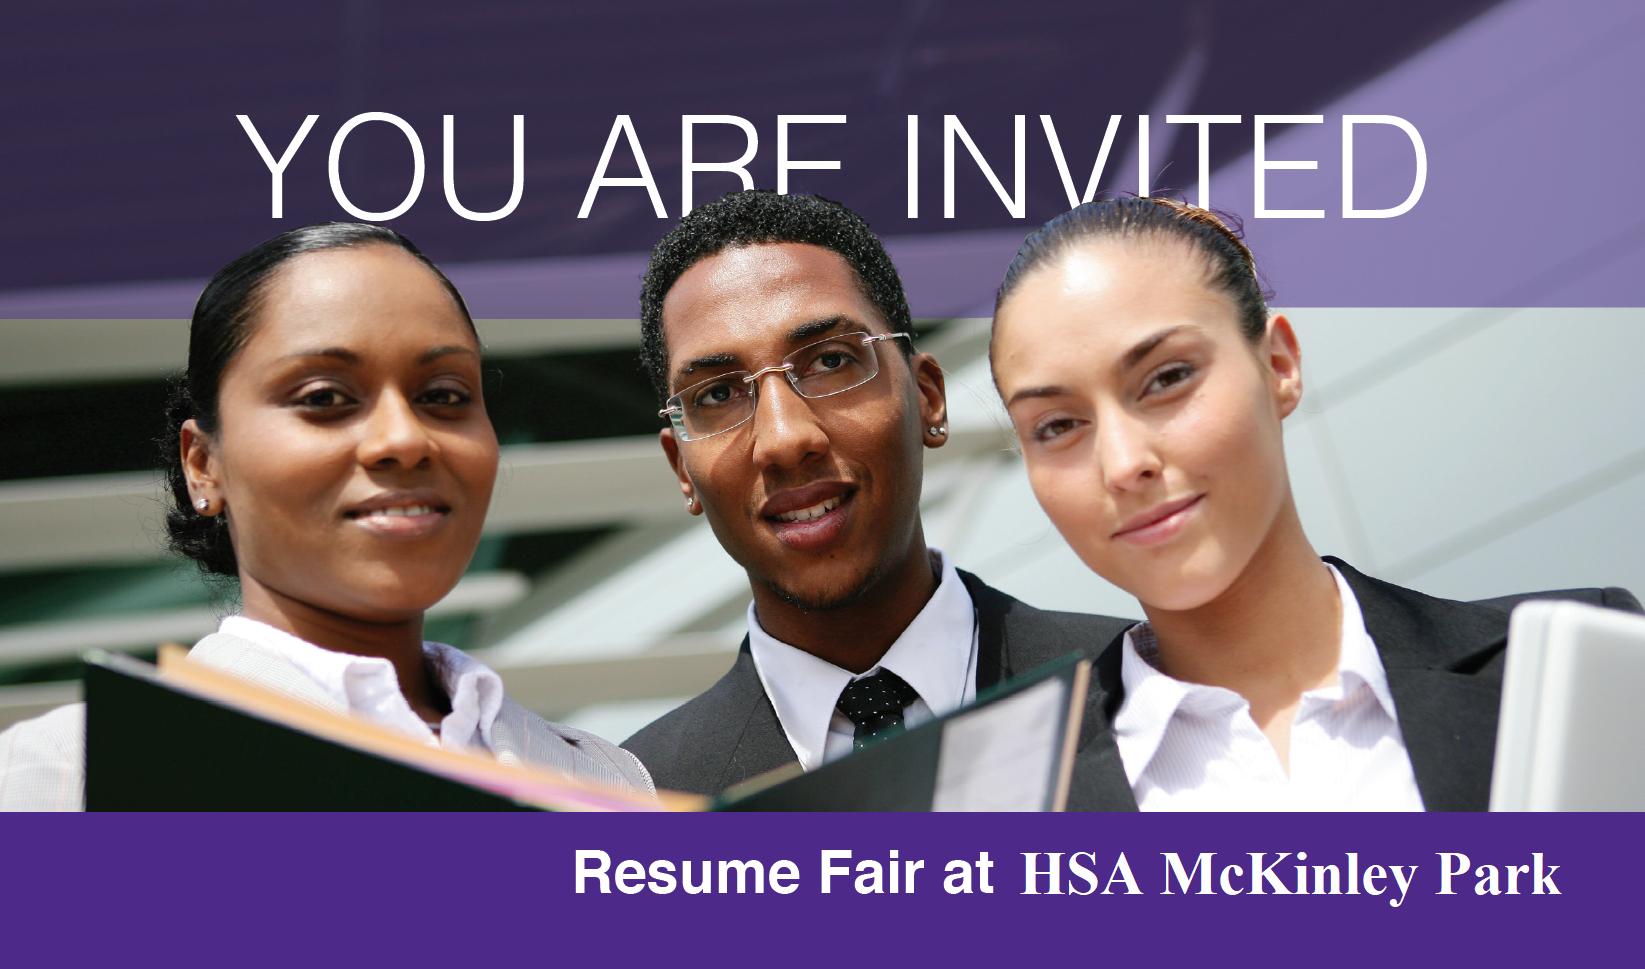 Resume Fair at HSA-McKinley Park!